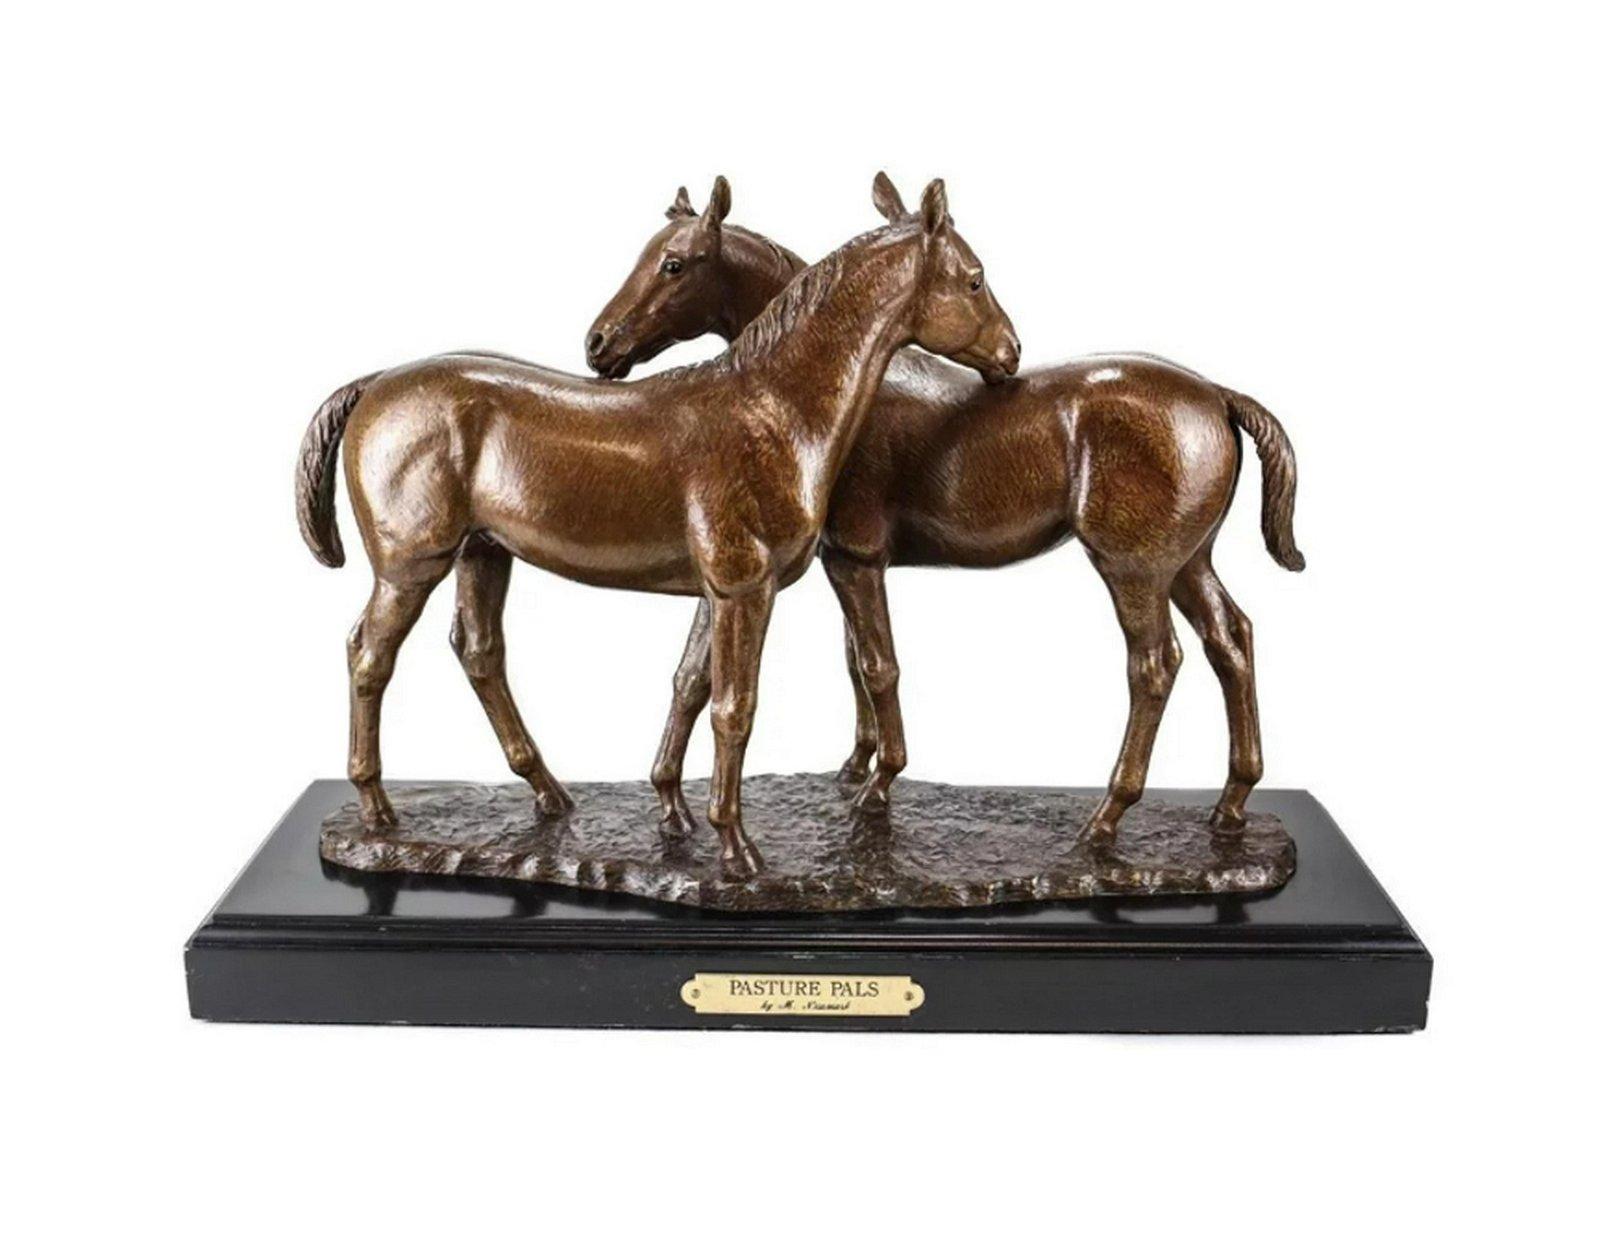 Marilyn Newmark Bronze Sculpture Pasture Pals Signed AP